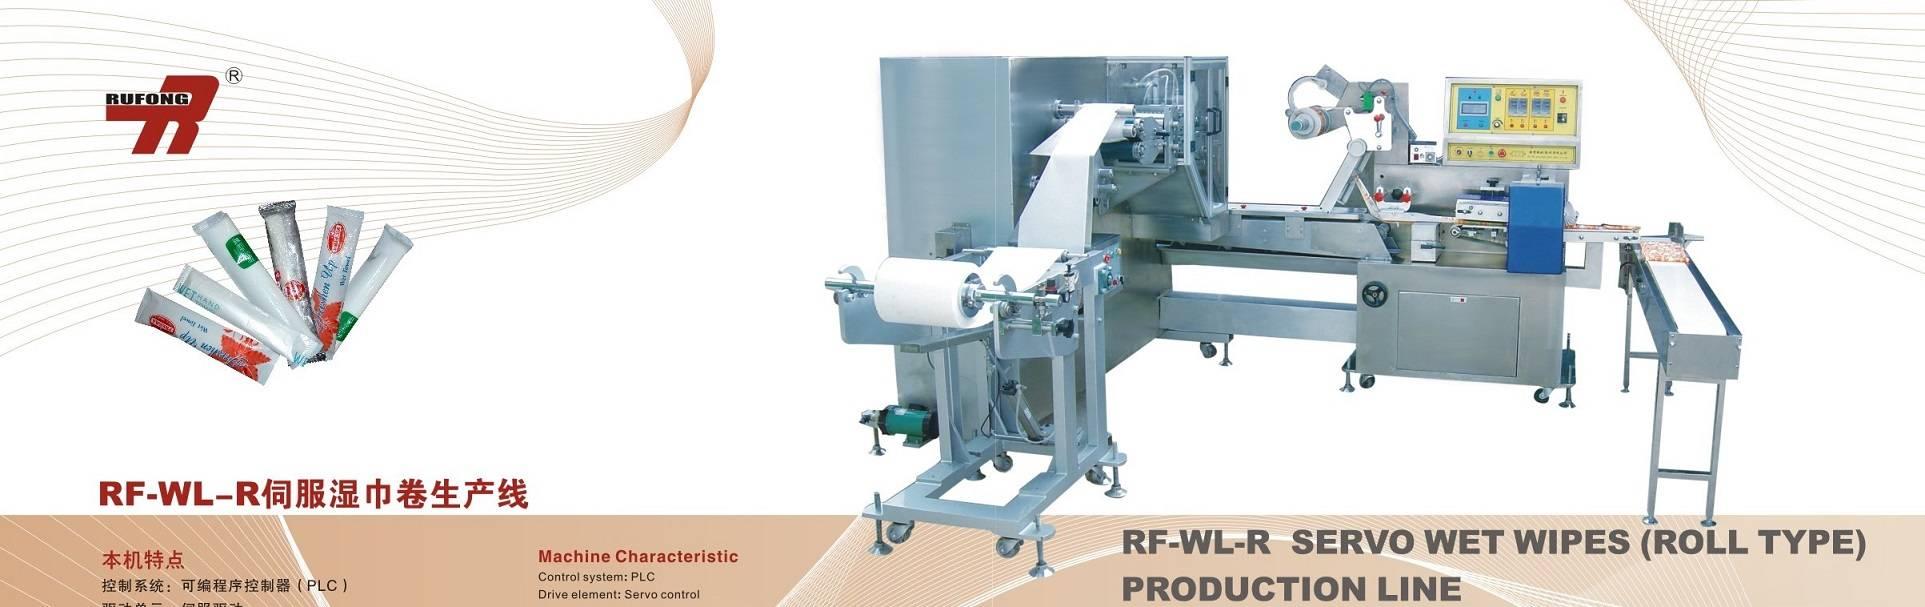 RF-WL-R Servo Wet Wipes(Roll Type) Production Line